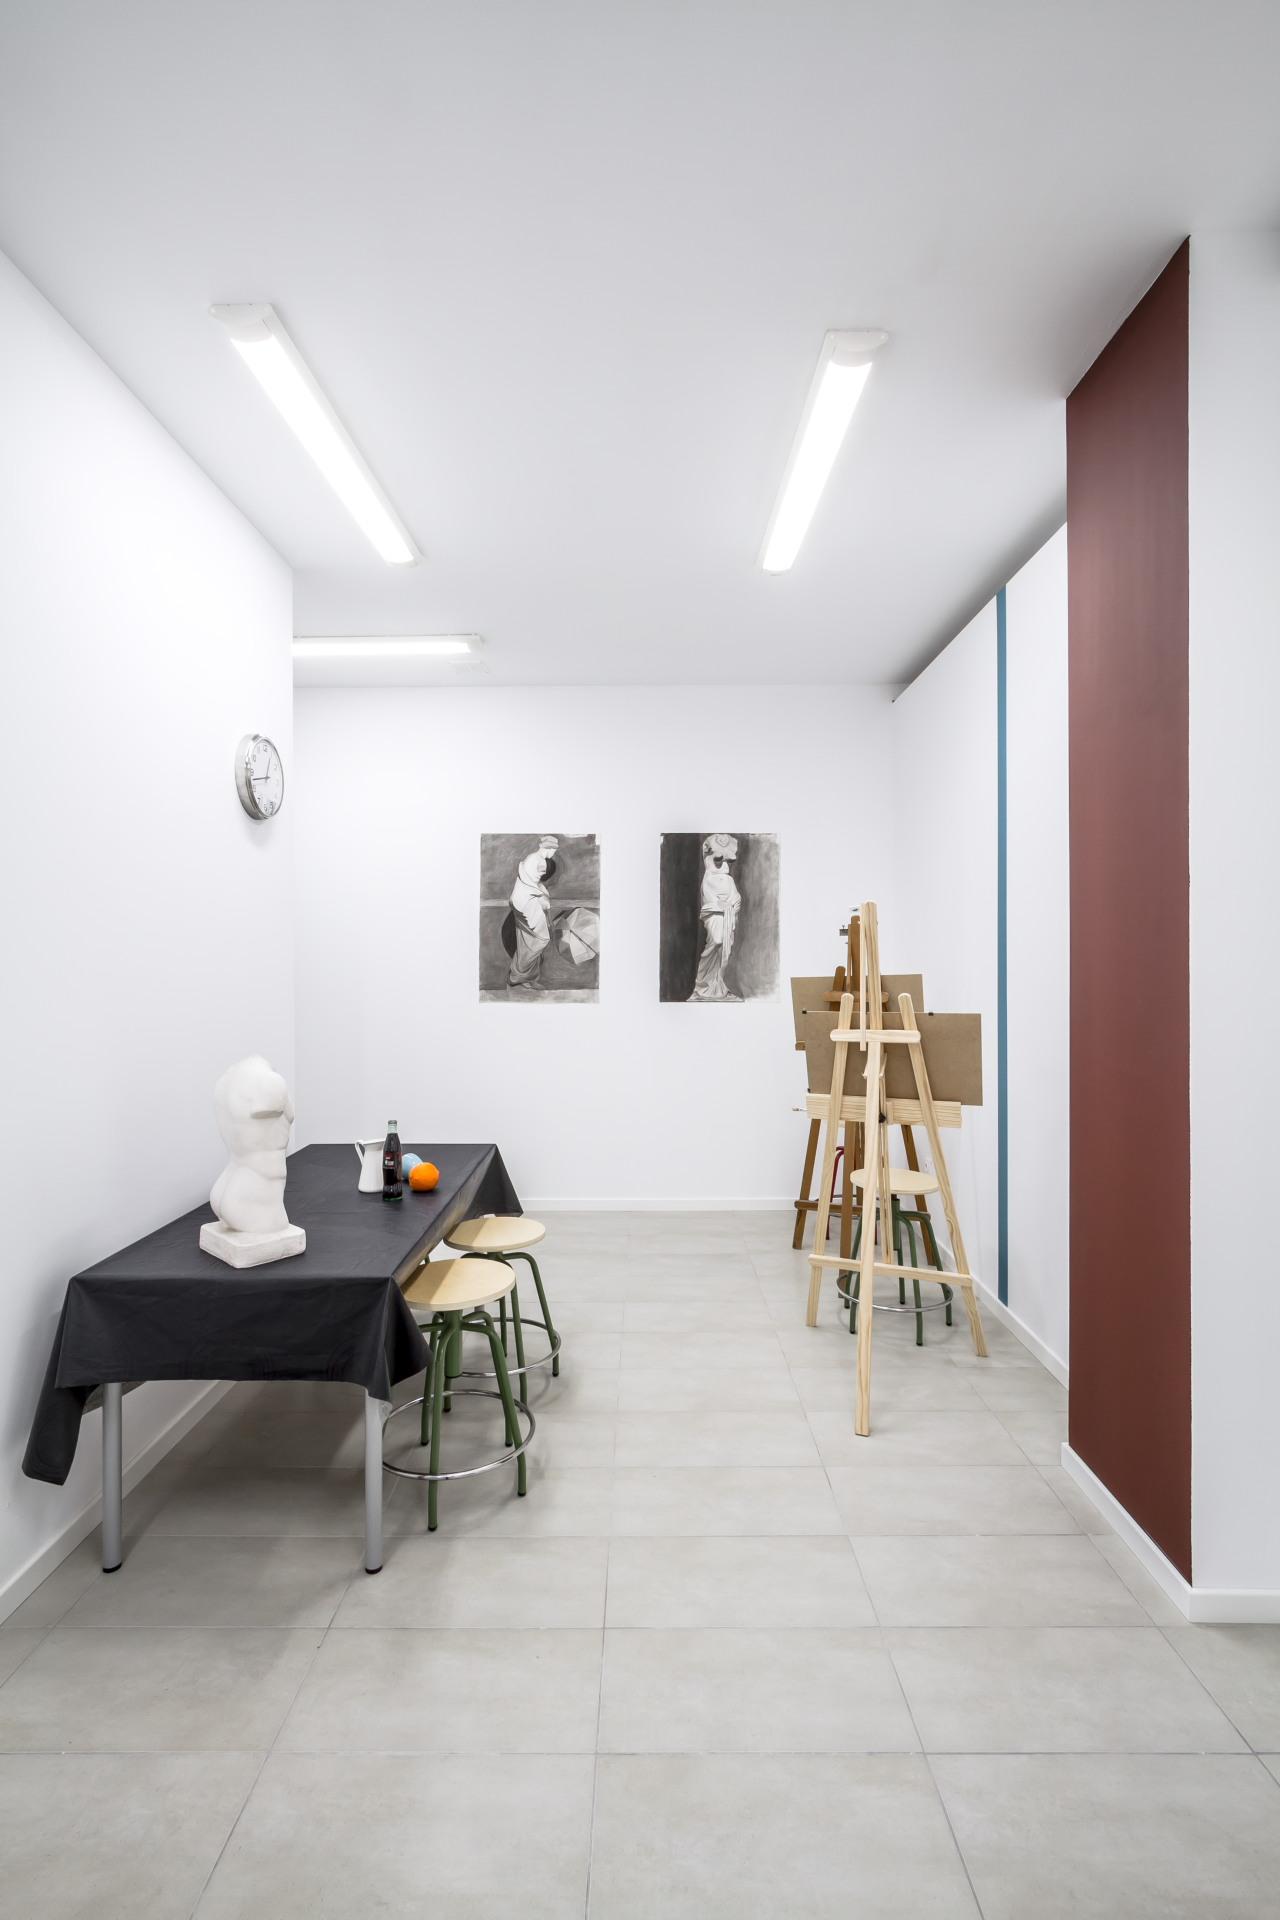 fotografia-arquitectura-valencia-german-cabo-viraje-atelier (5)